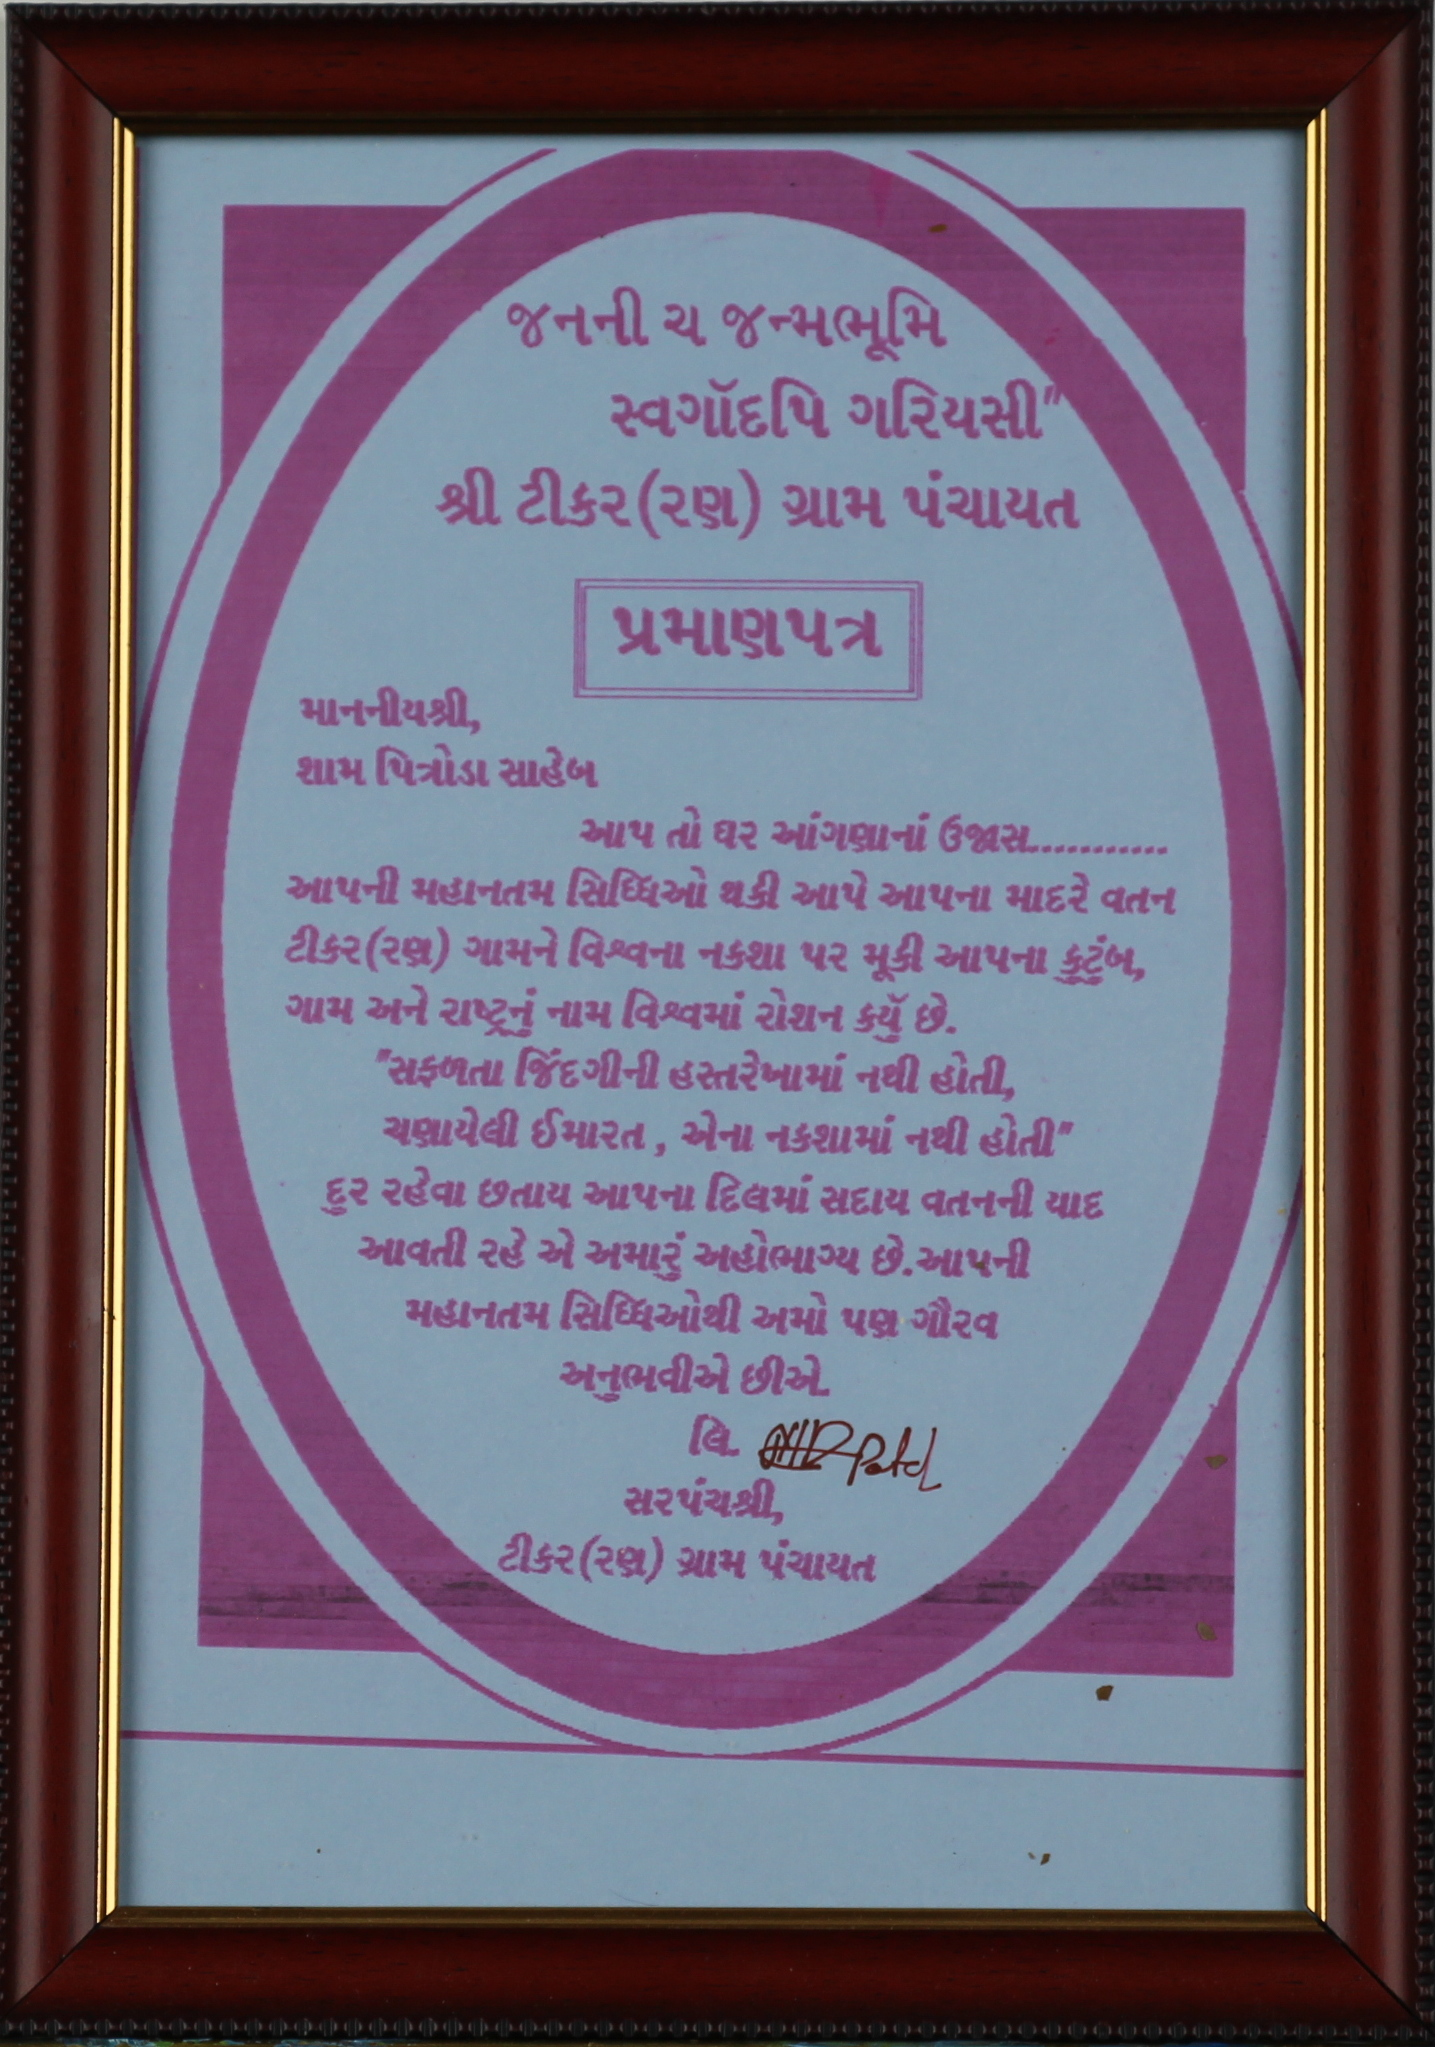 Award of Appreciation, Gram Panchayat Tikar